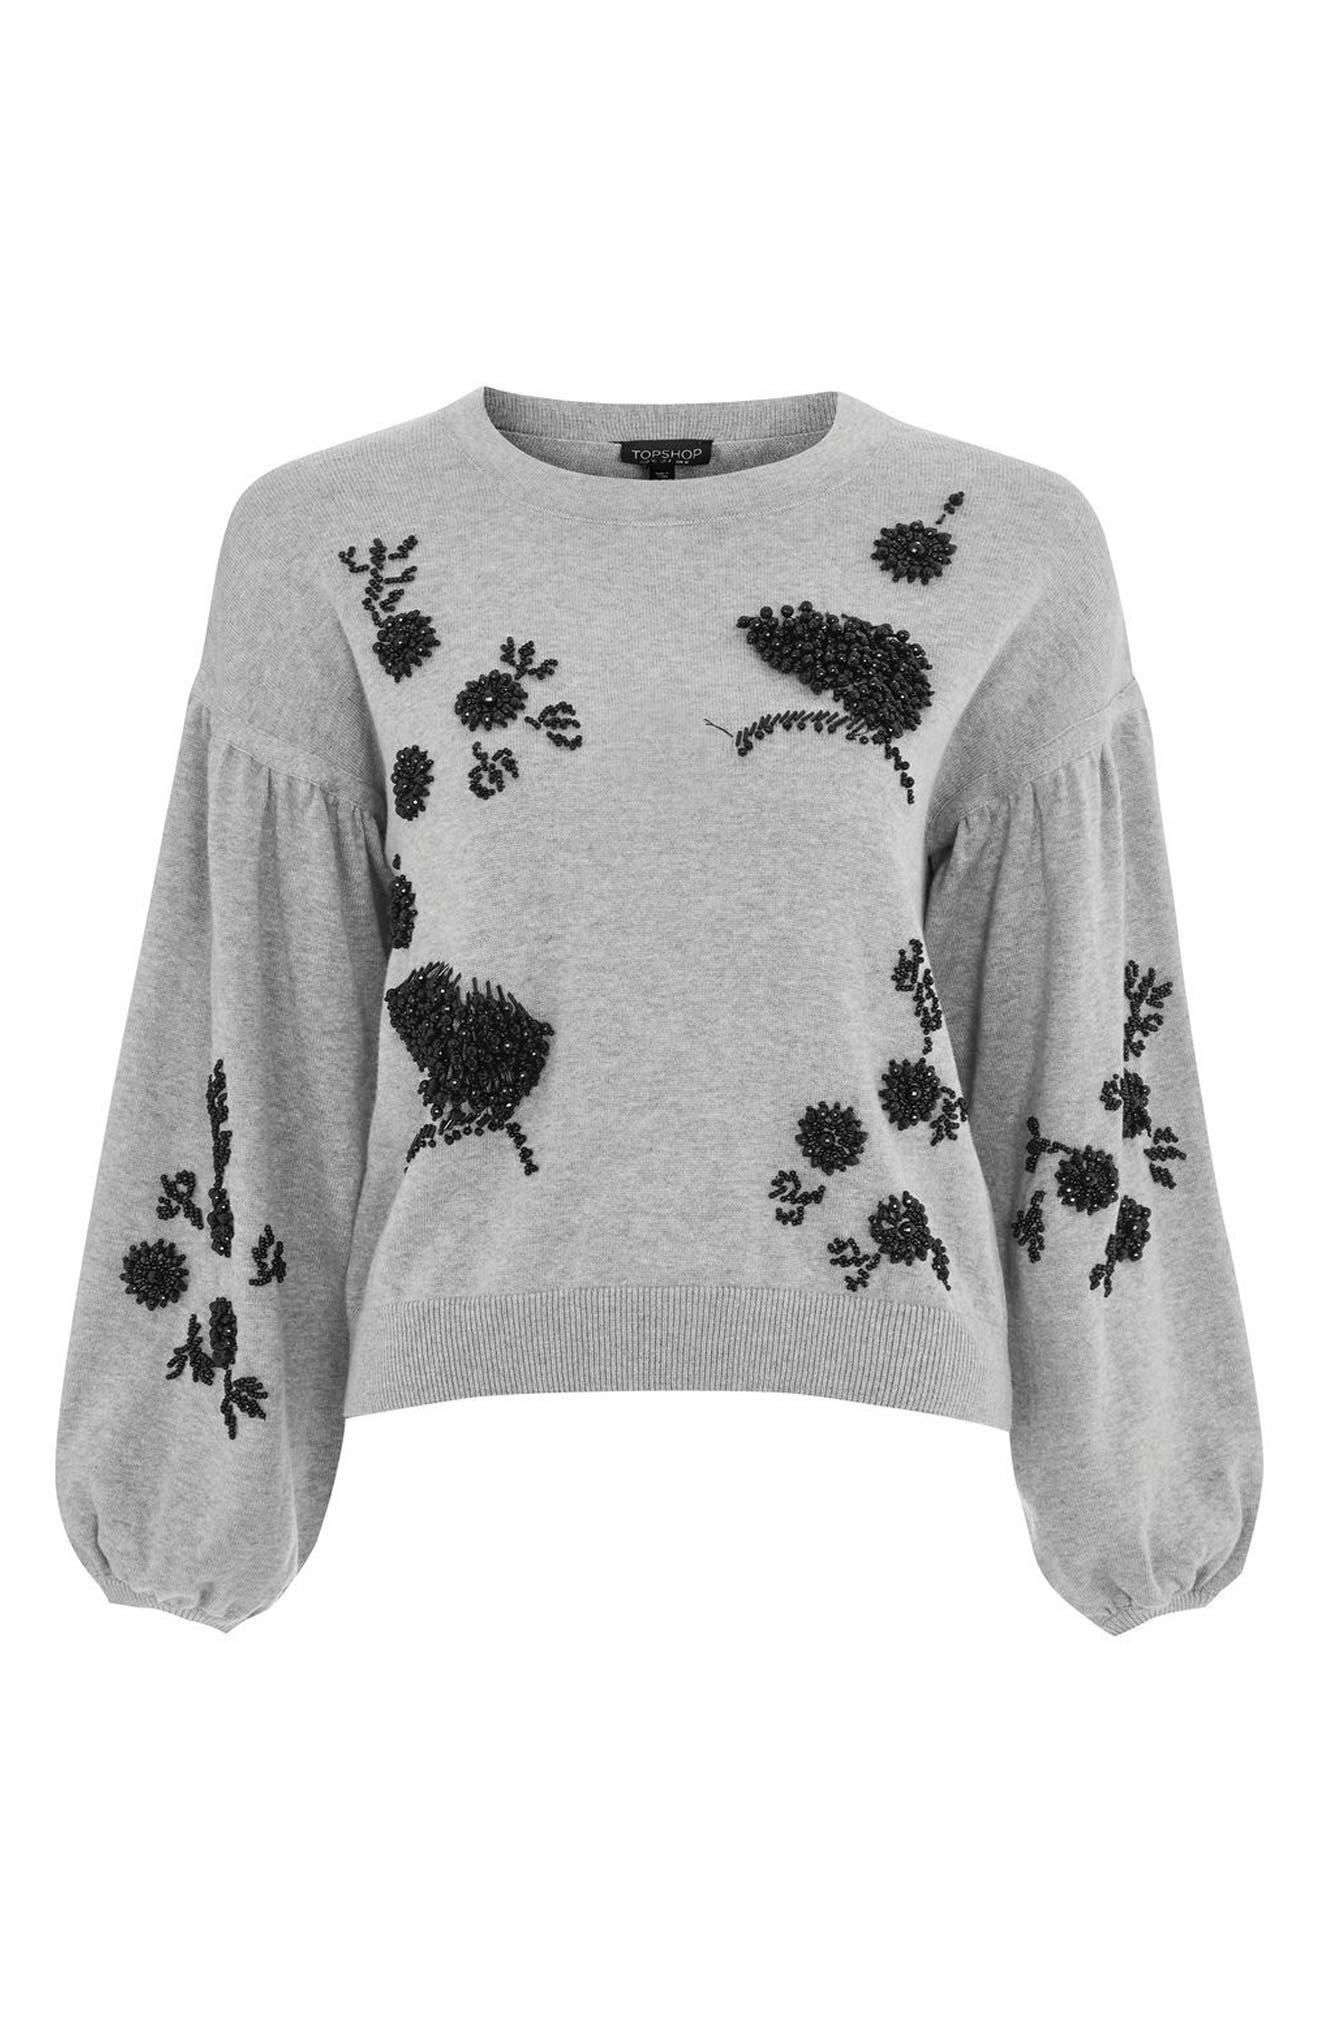 Beaded Balloon Sleeve Sweater,                             Alternate thumbnail 5, color,                             Grey Marl Multi